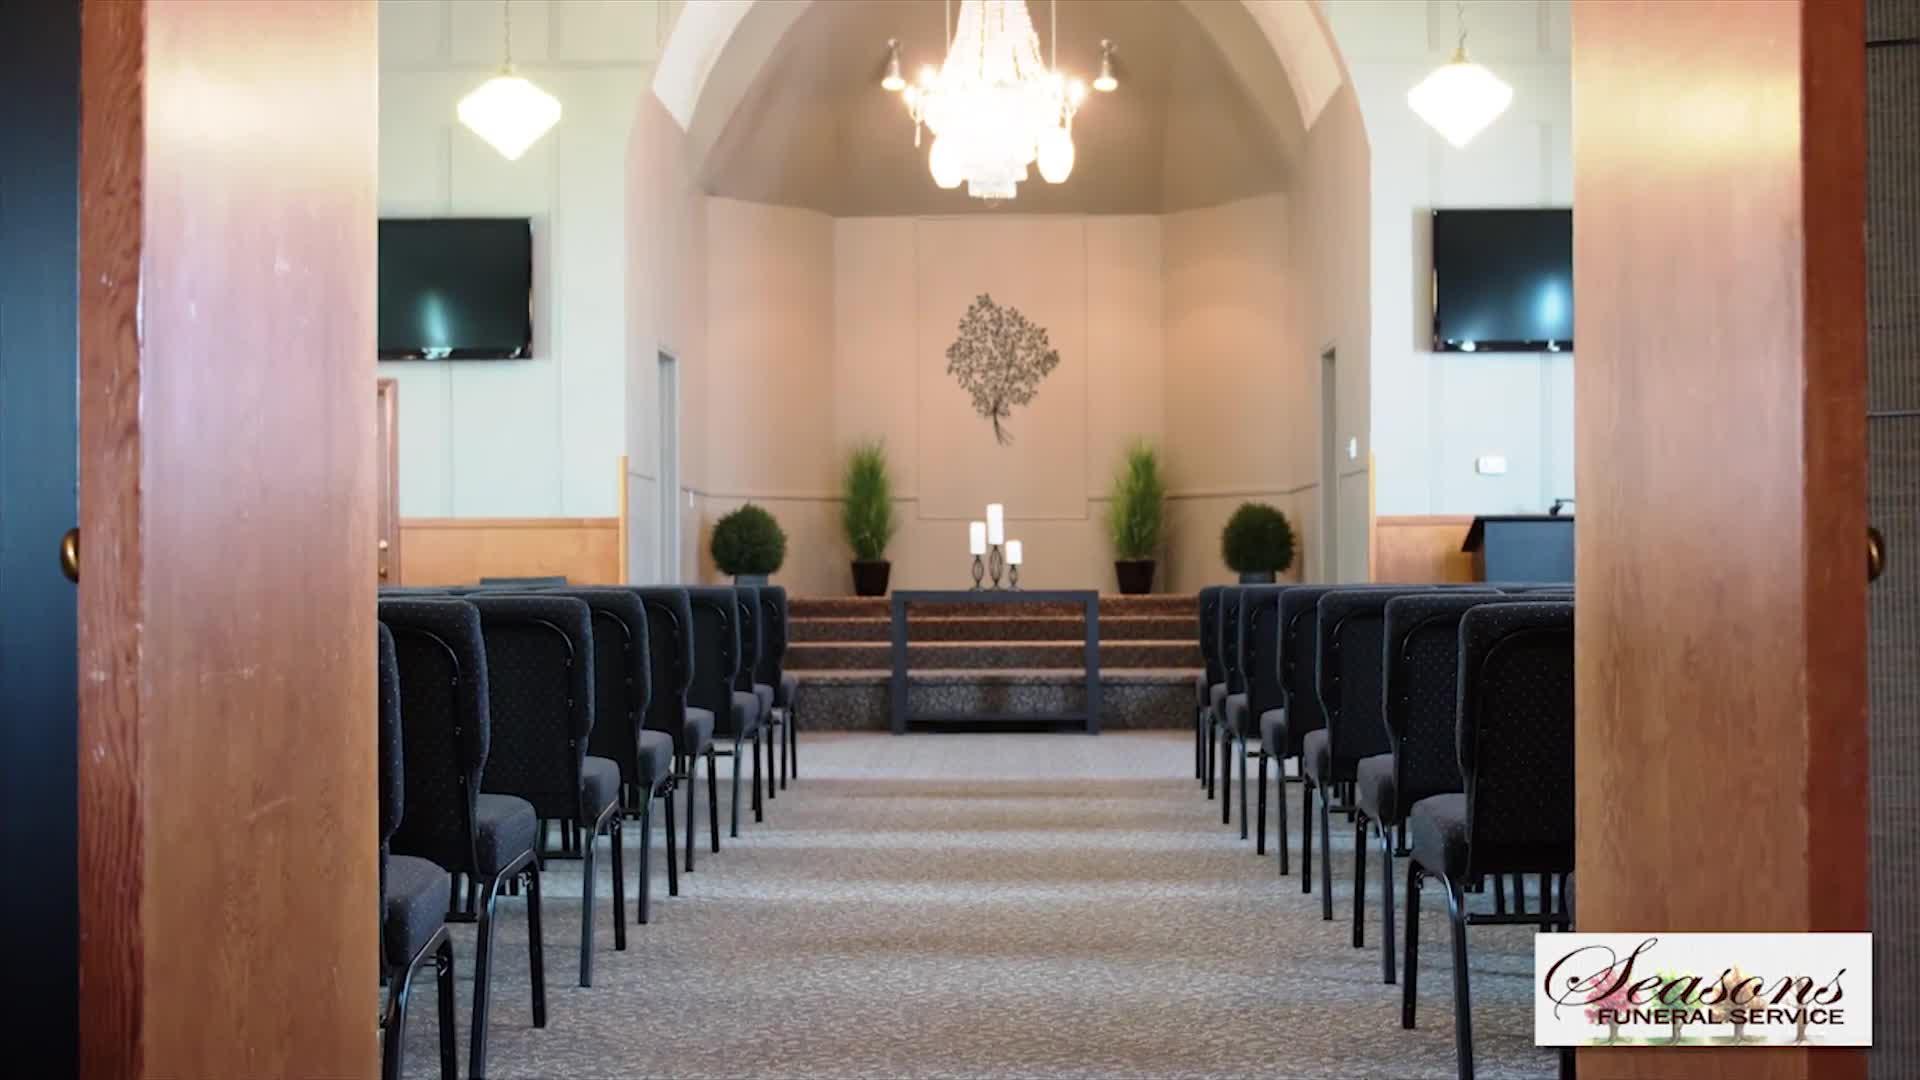 Seasons Funeral Service - Funeral Homes - 204-444-5444